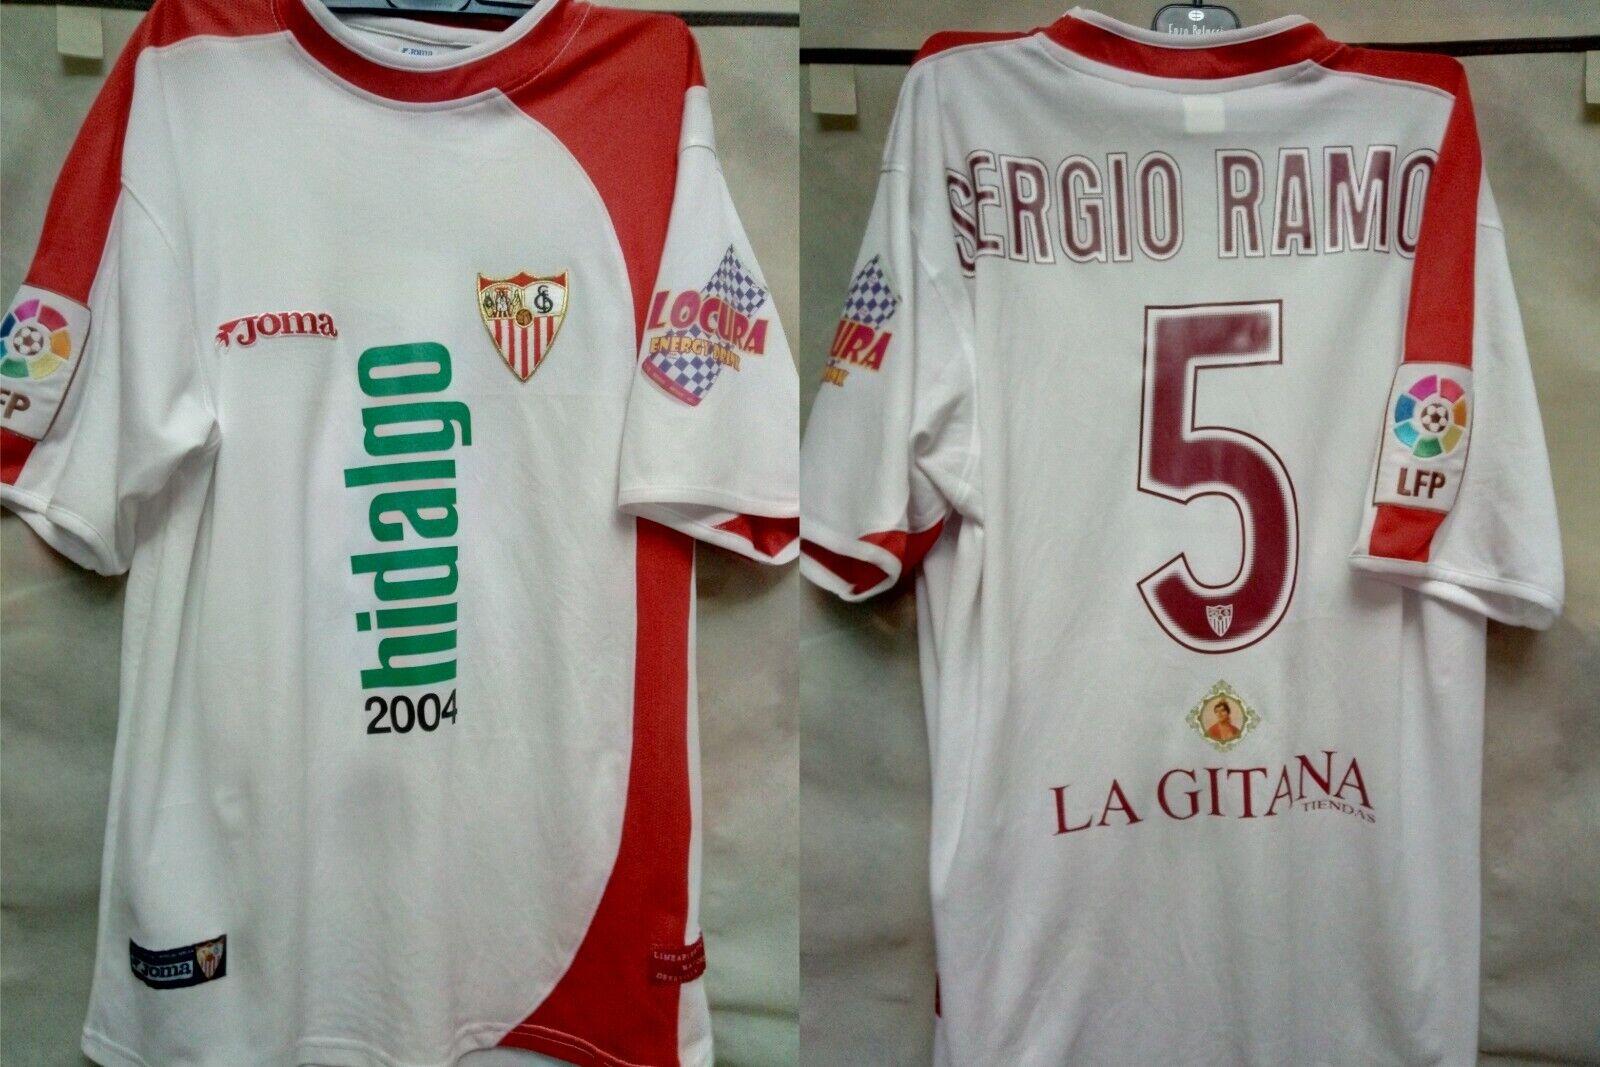 5 SERGIO RAMOS, SEVILLA FC Match Worn PLAYER home shirt, Spanish LFP 200405